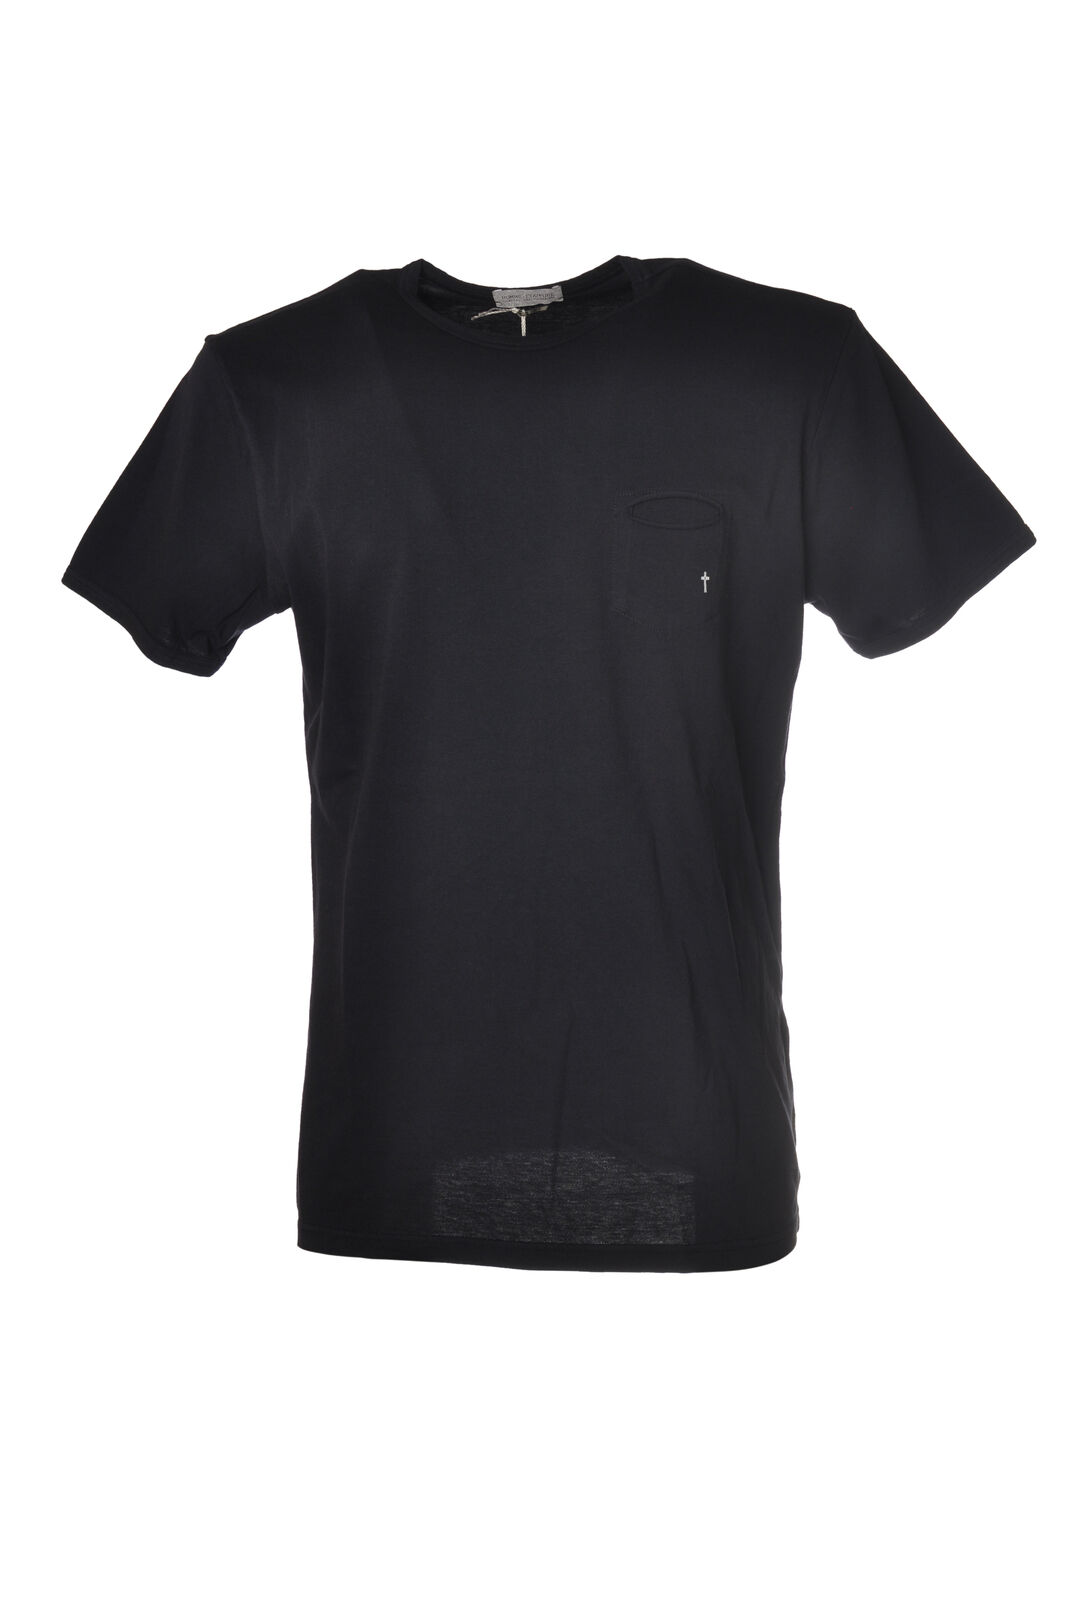 Daniele Alessandrini - Topwear-T-shirts -  Herren - Blu - 5626109L180924